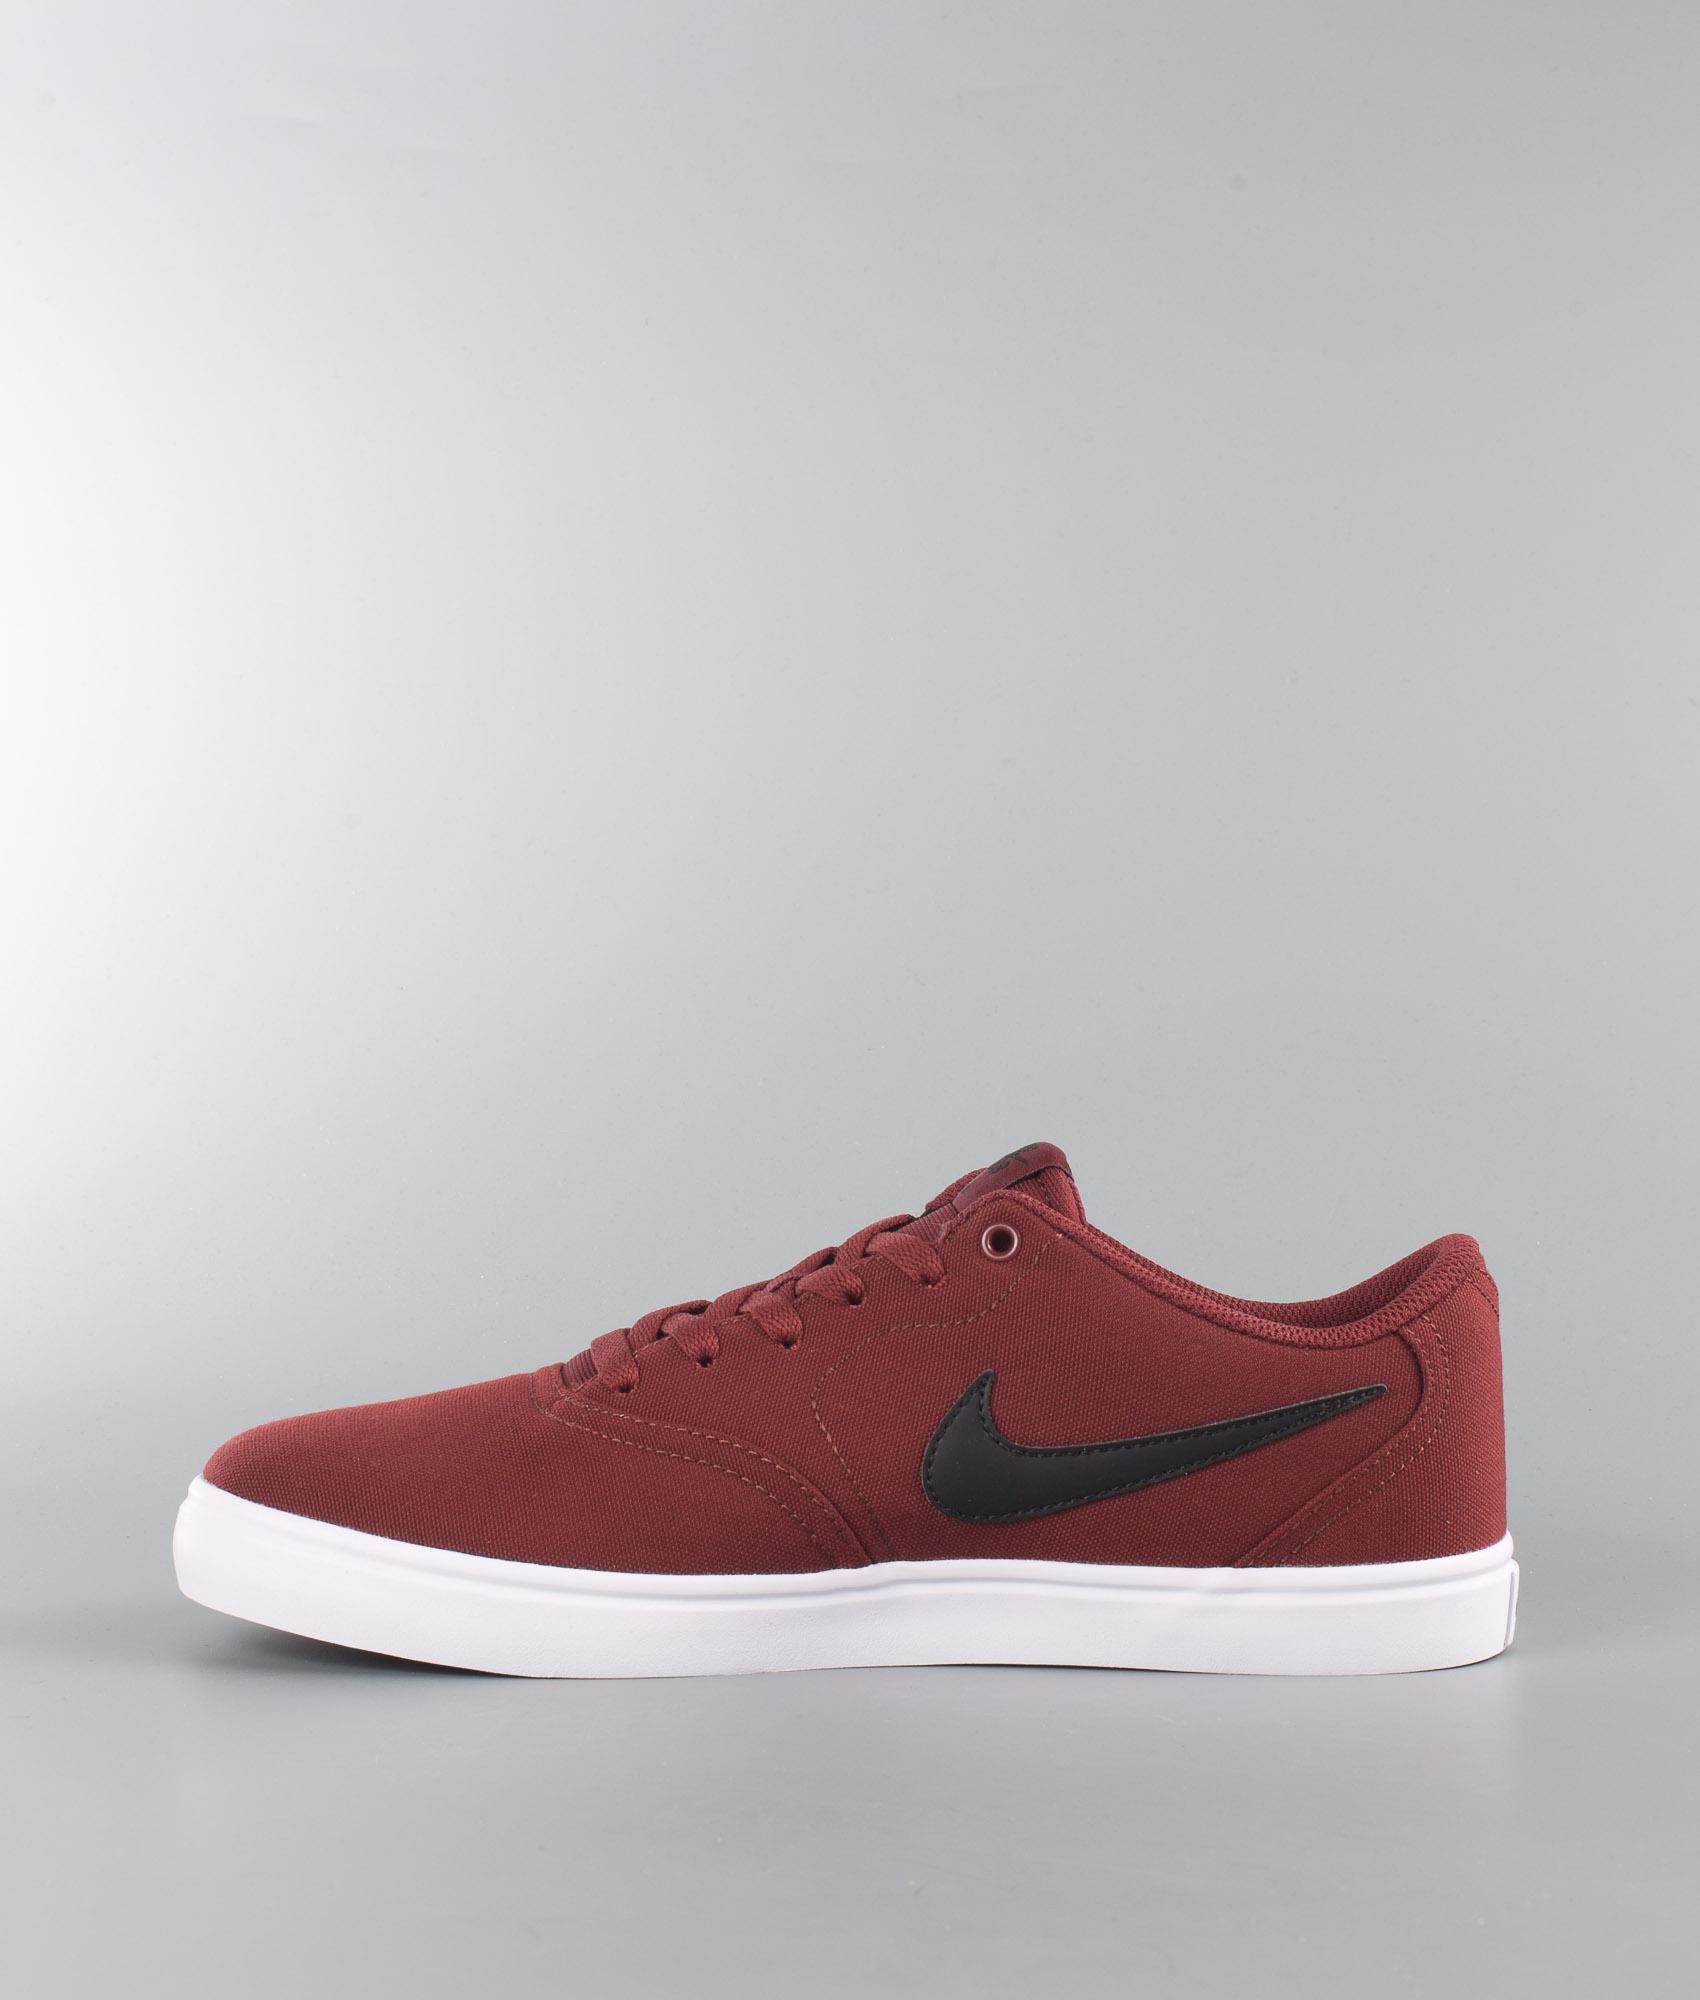 Nike Canvas Solarsoft Check White Dark Redblack Team Shoes kiXTPuZO